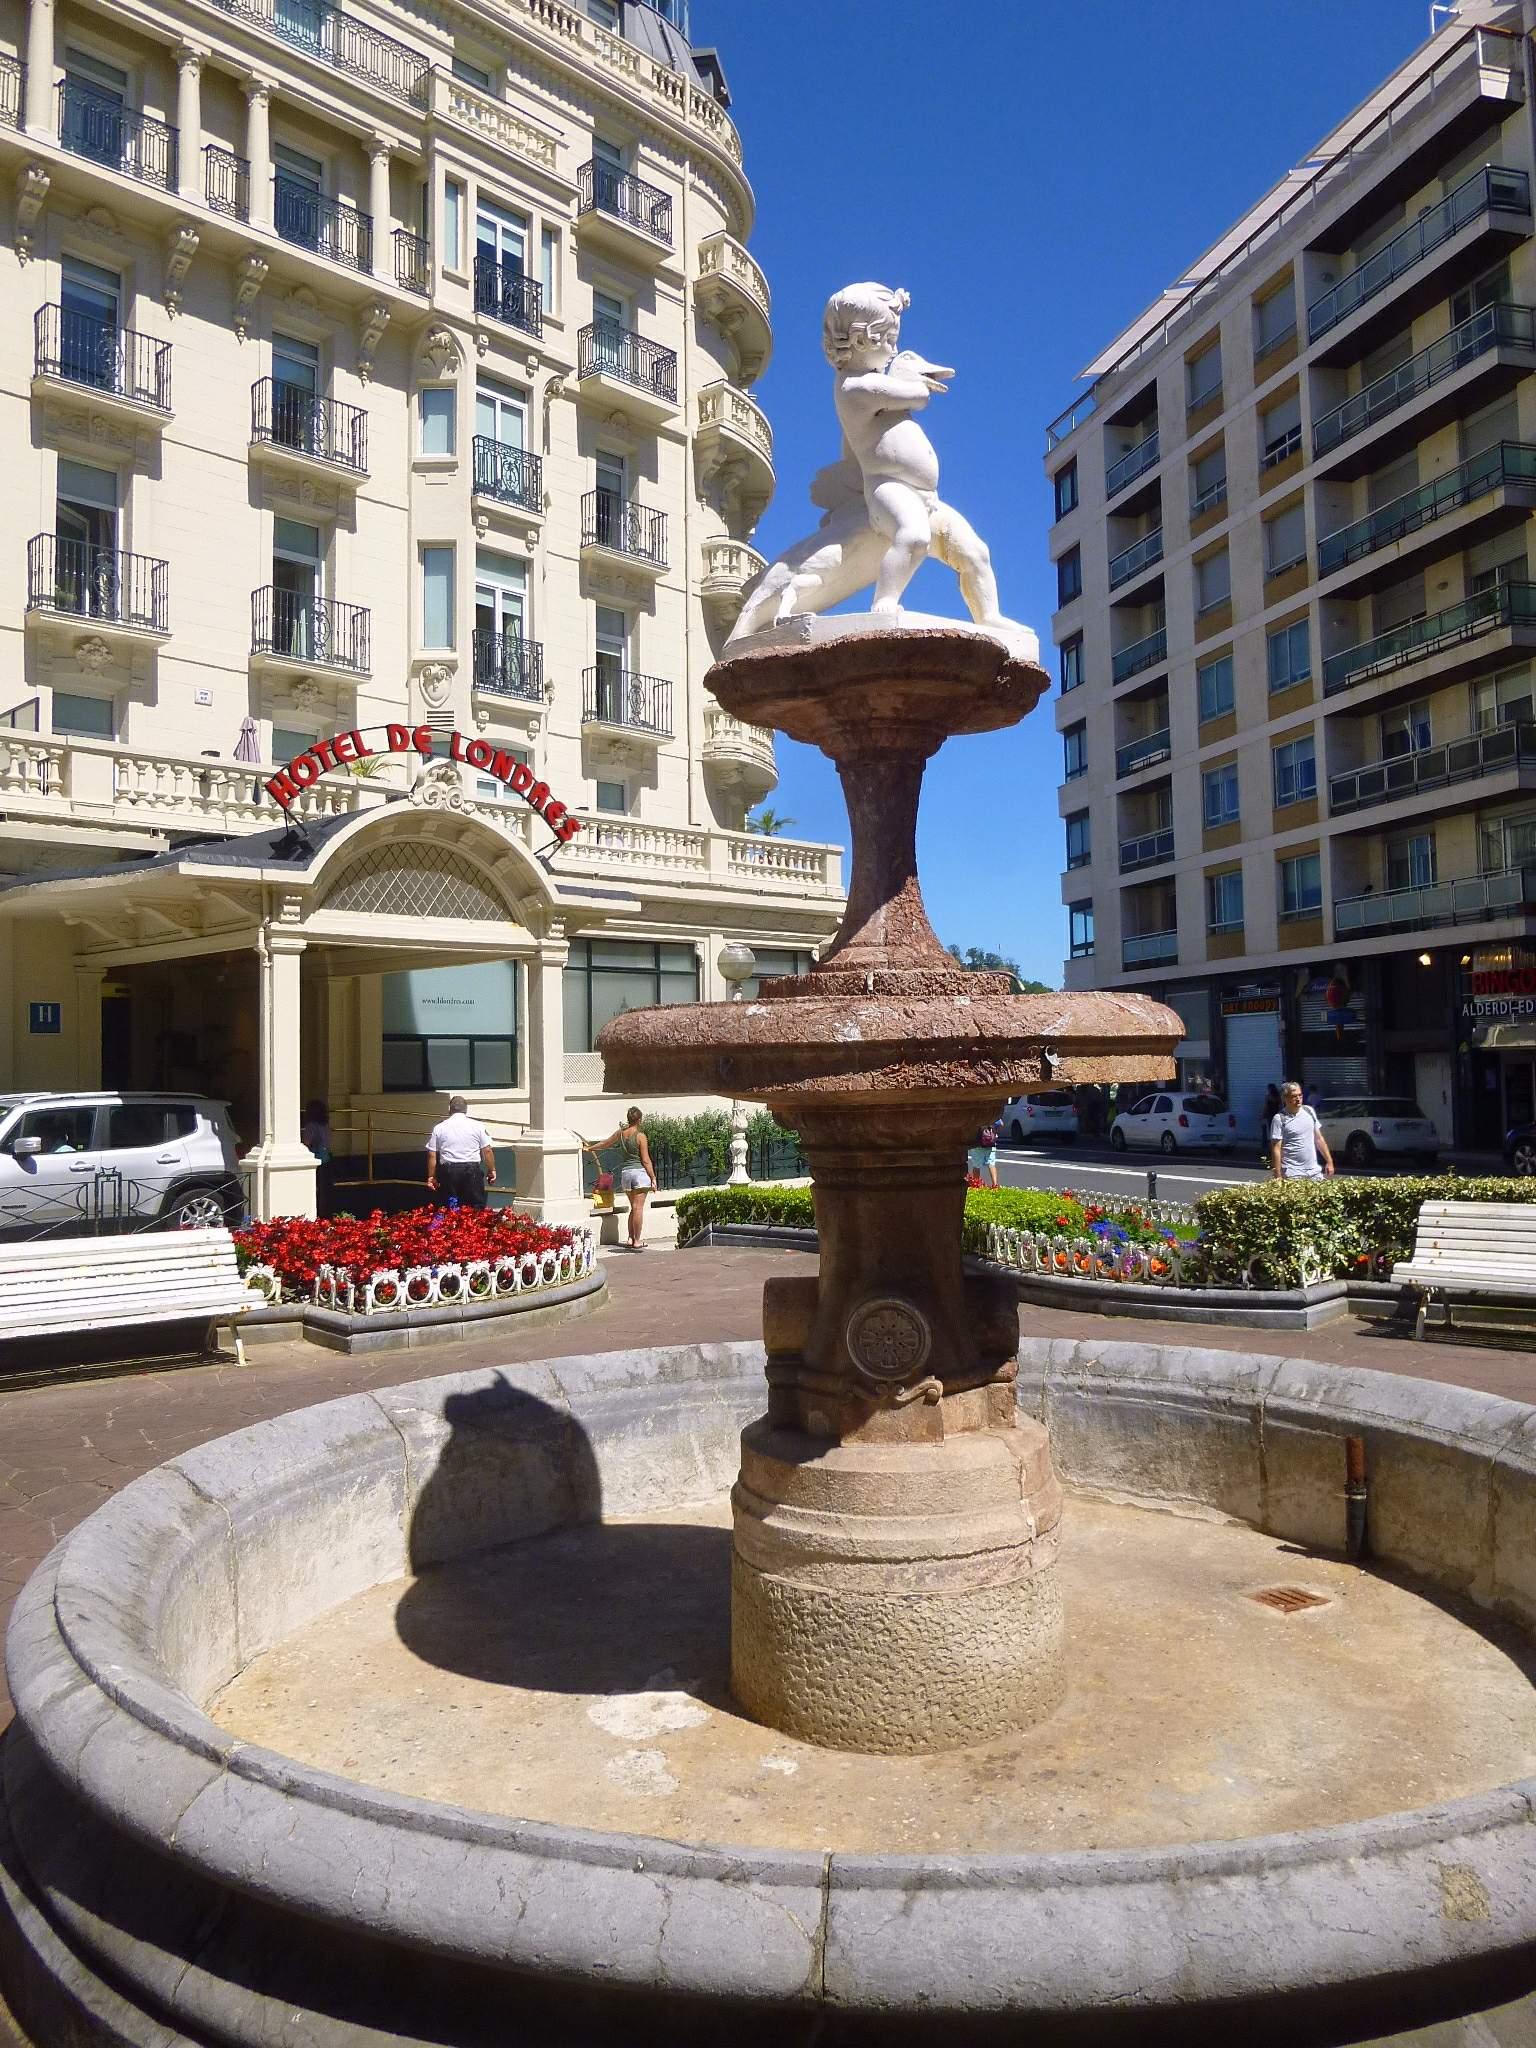 File:San Sebastián - Plaza Xabier Zubiri y Hotel de Londres y de Inglaterra  3.jpg - Wikimedia Commons